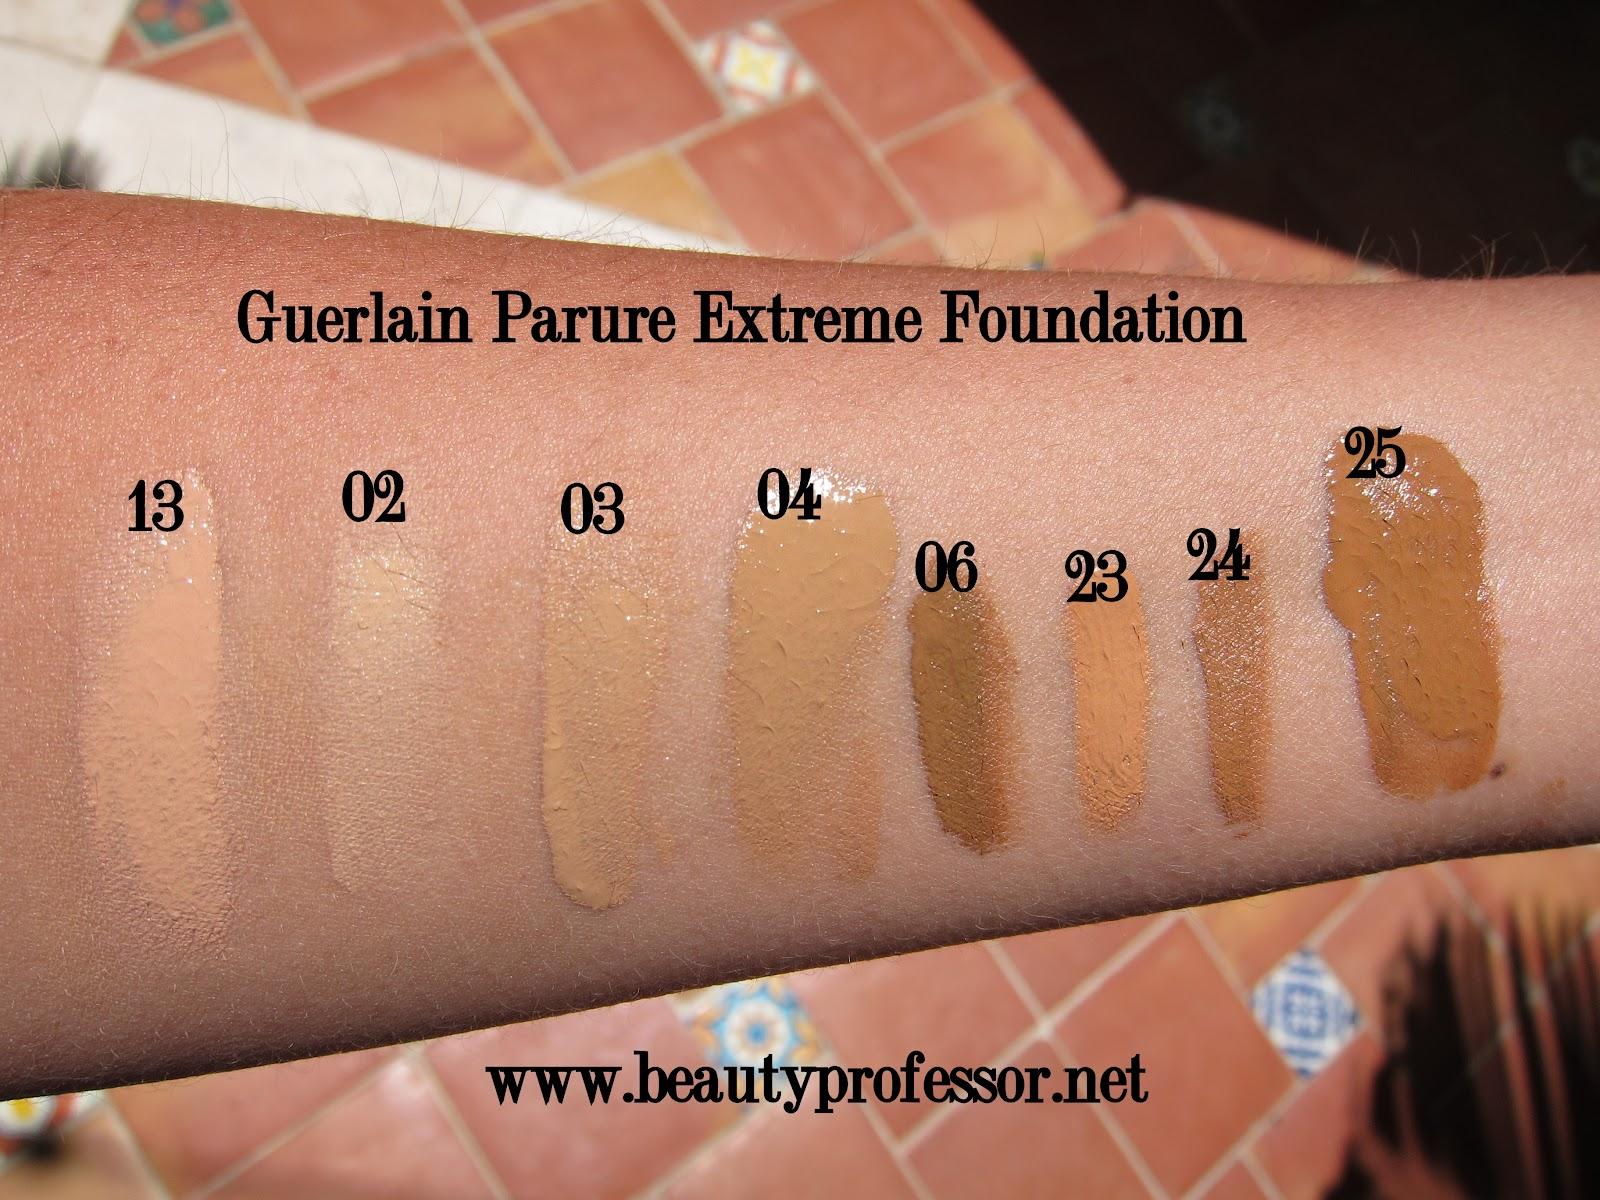 foto ufficiali Sconto del 60% ufficiale Beauty Professor: Guerlain Parure Extreme Foundation Swatches